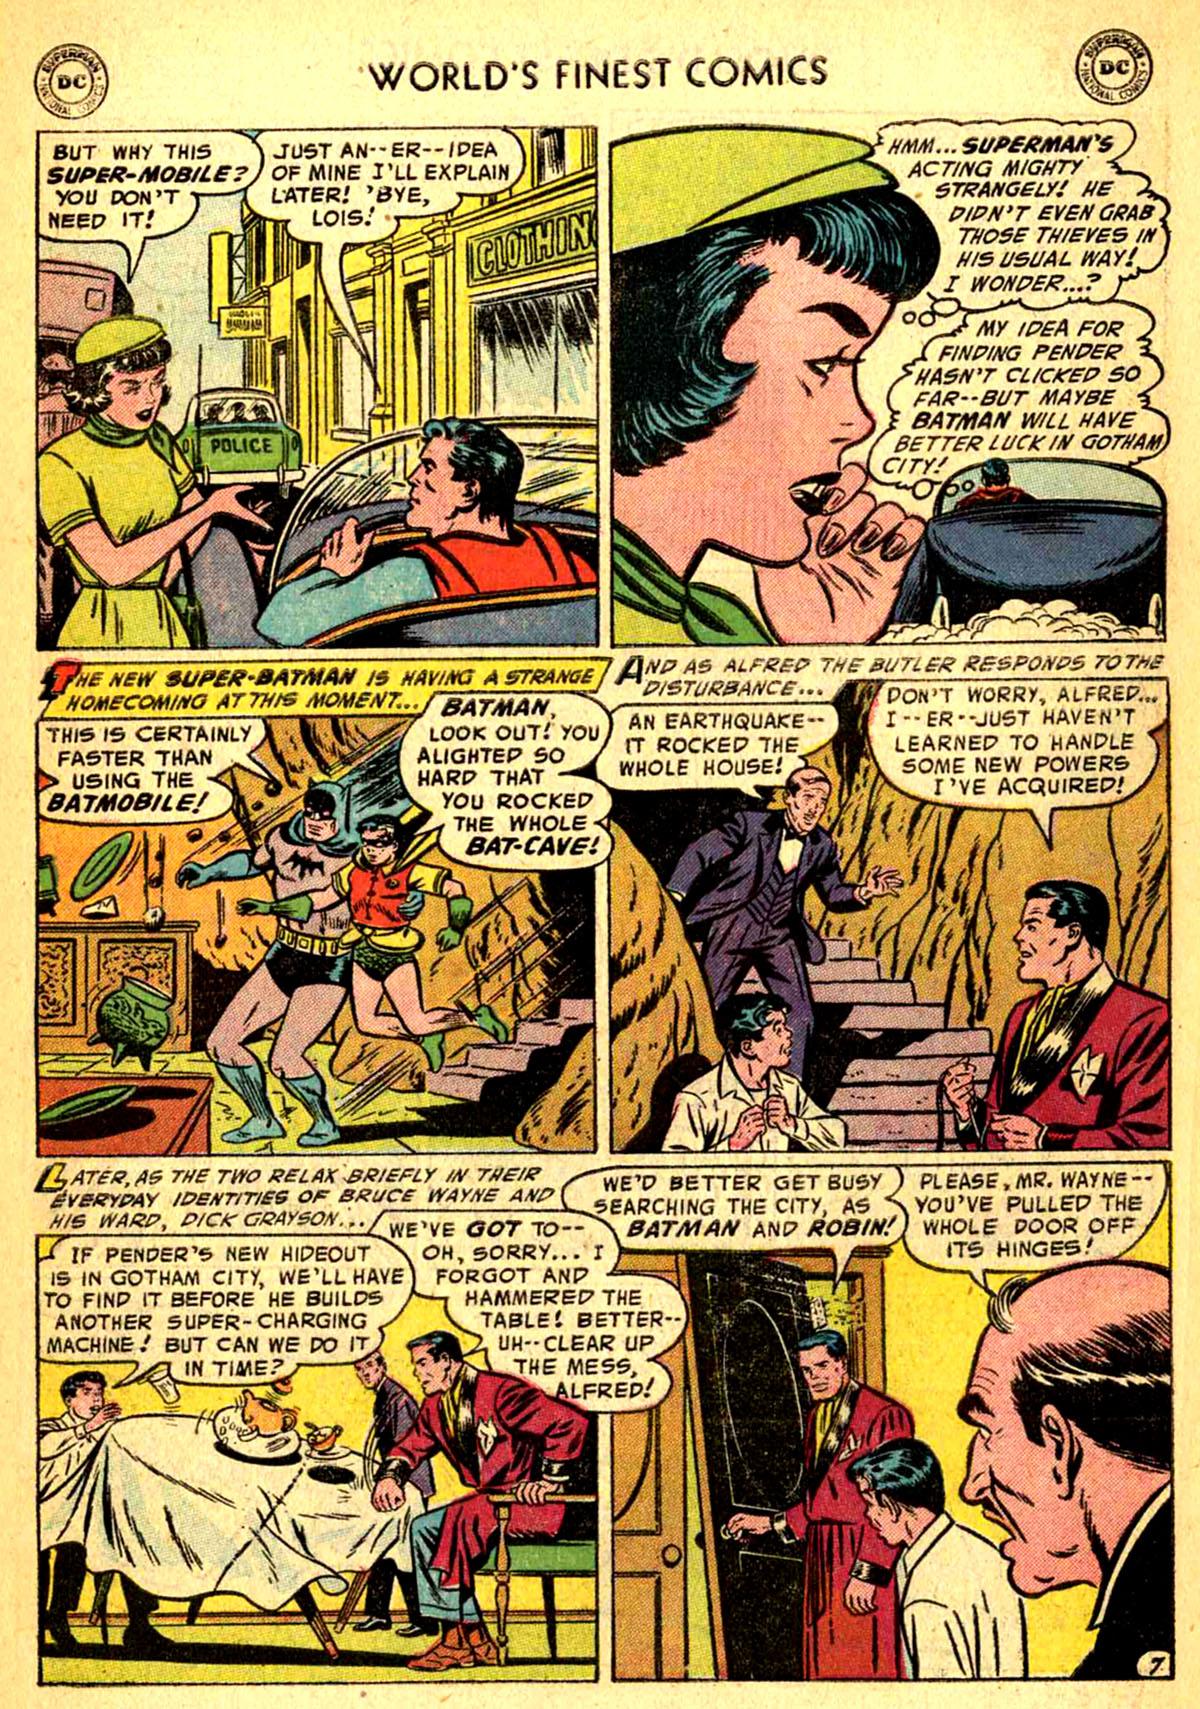 Read online World's Finest Comics comic -  Issue #77 - 9